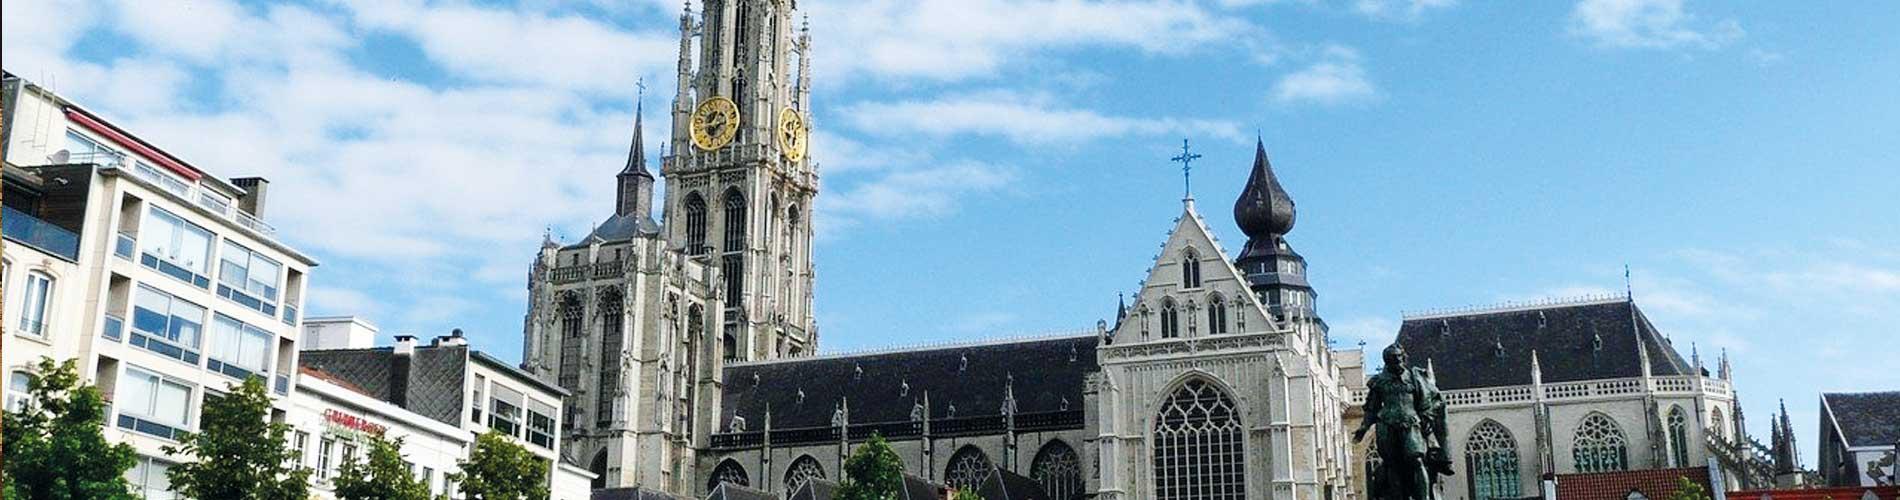 Blog_EuropeanCapitalCulture_Antwerp_1900x500_Q120